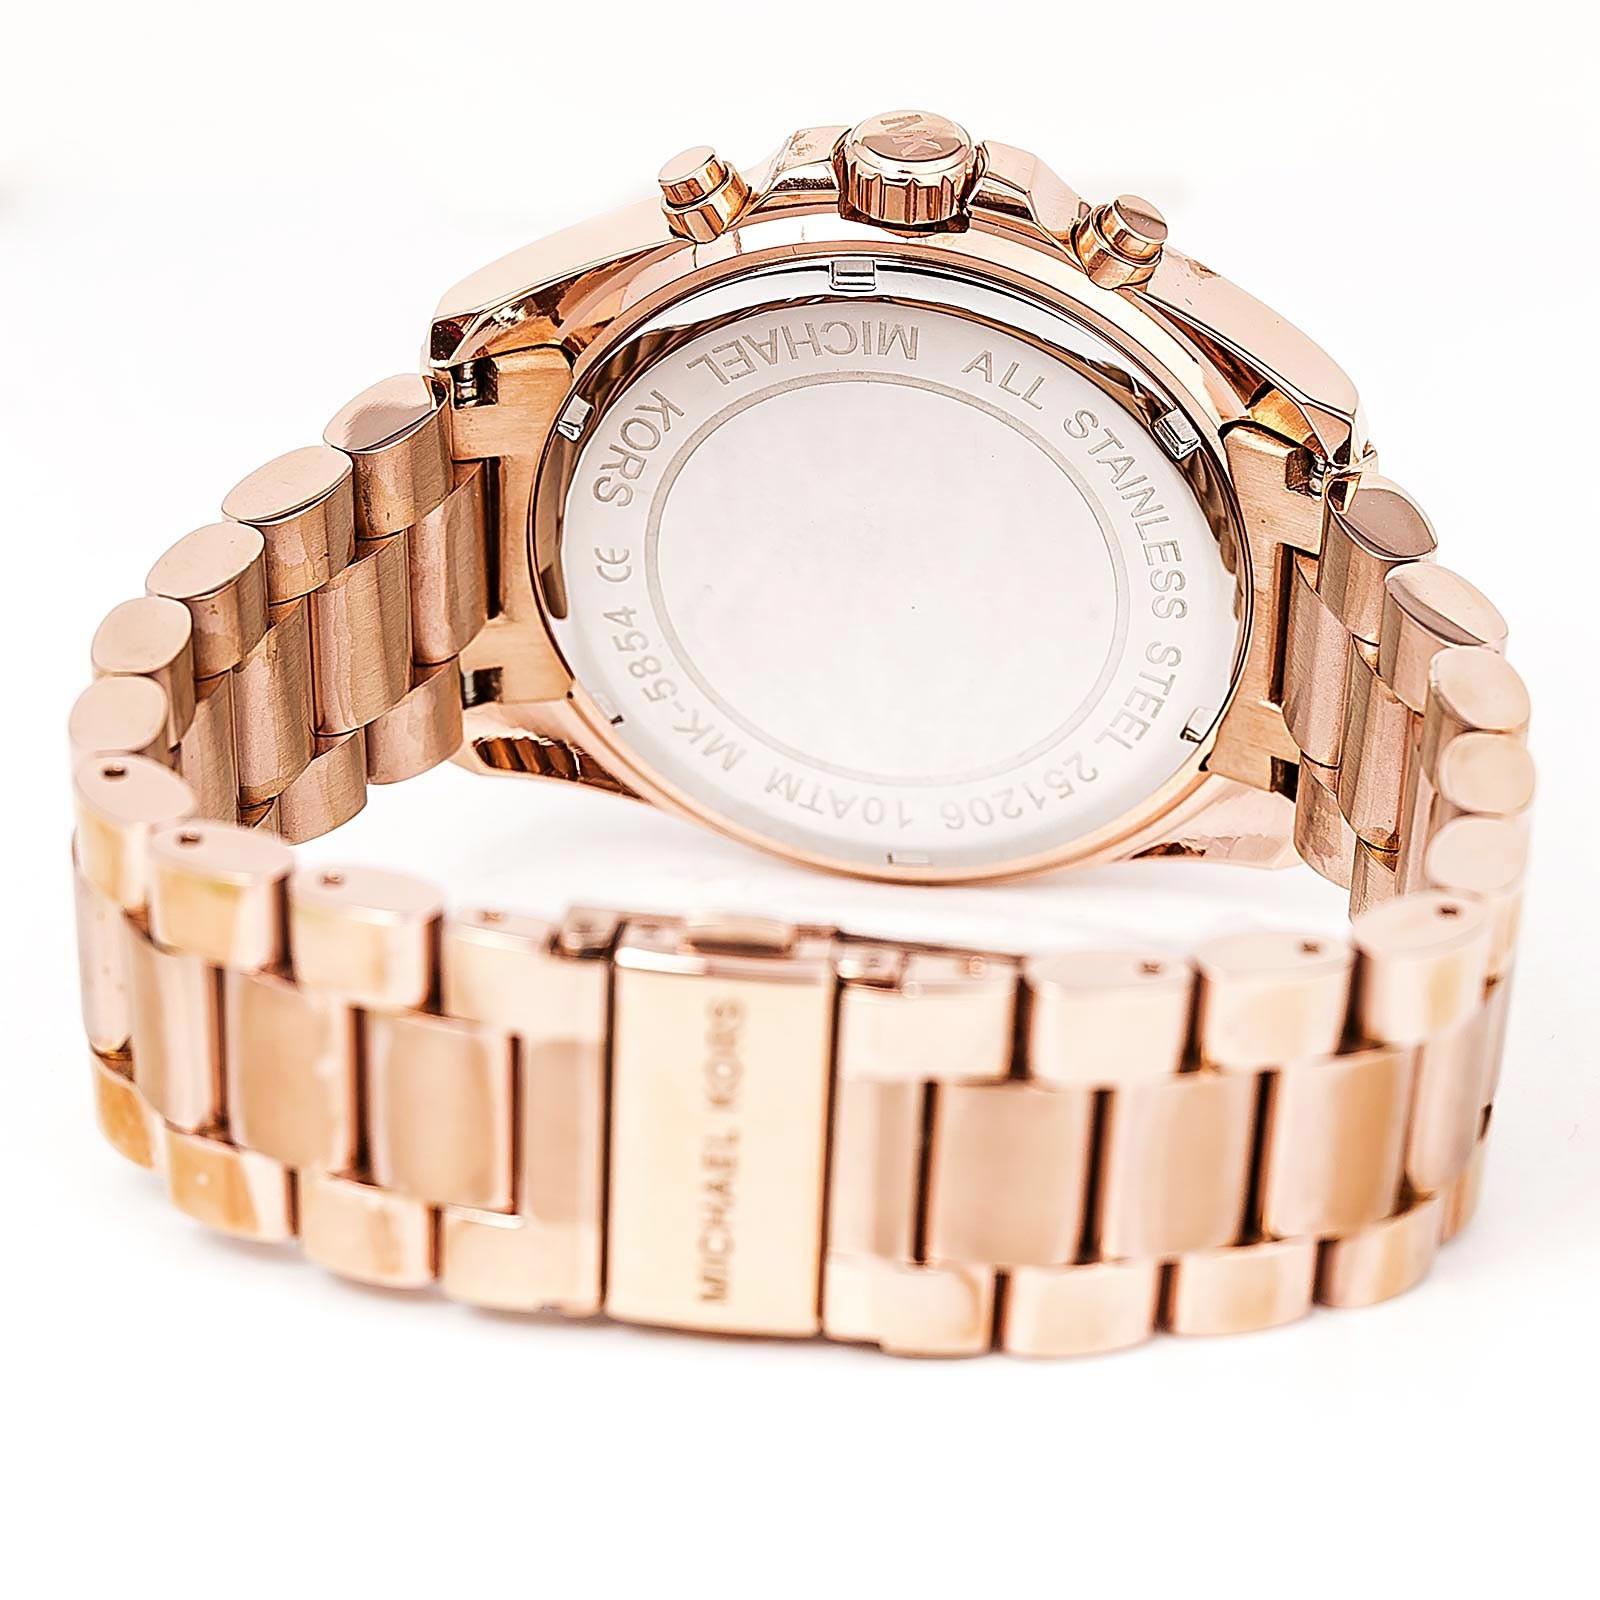 6a21f84fd4170 Michael Kors Ladies Rose Gold Bradshaw Chronograph Watch MK5854